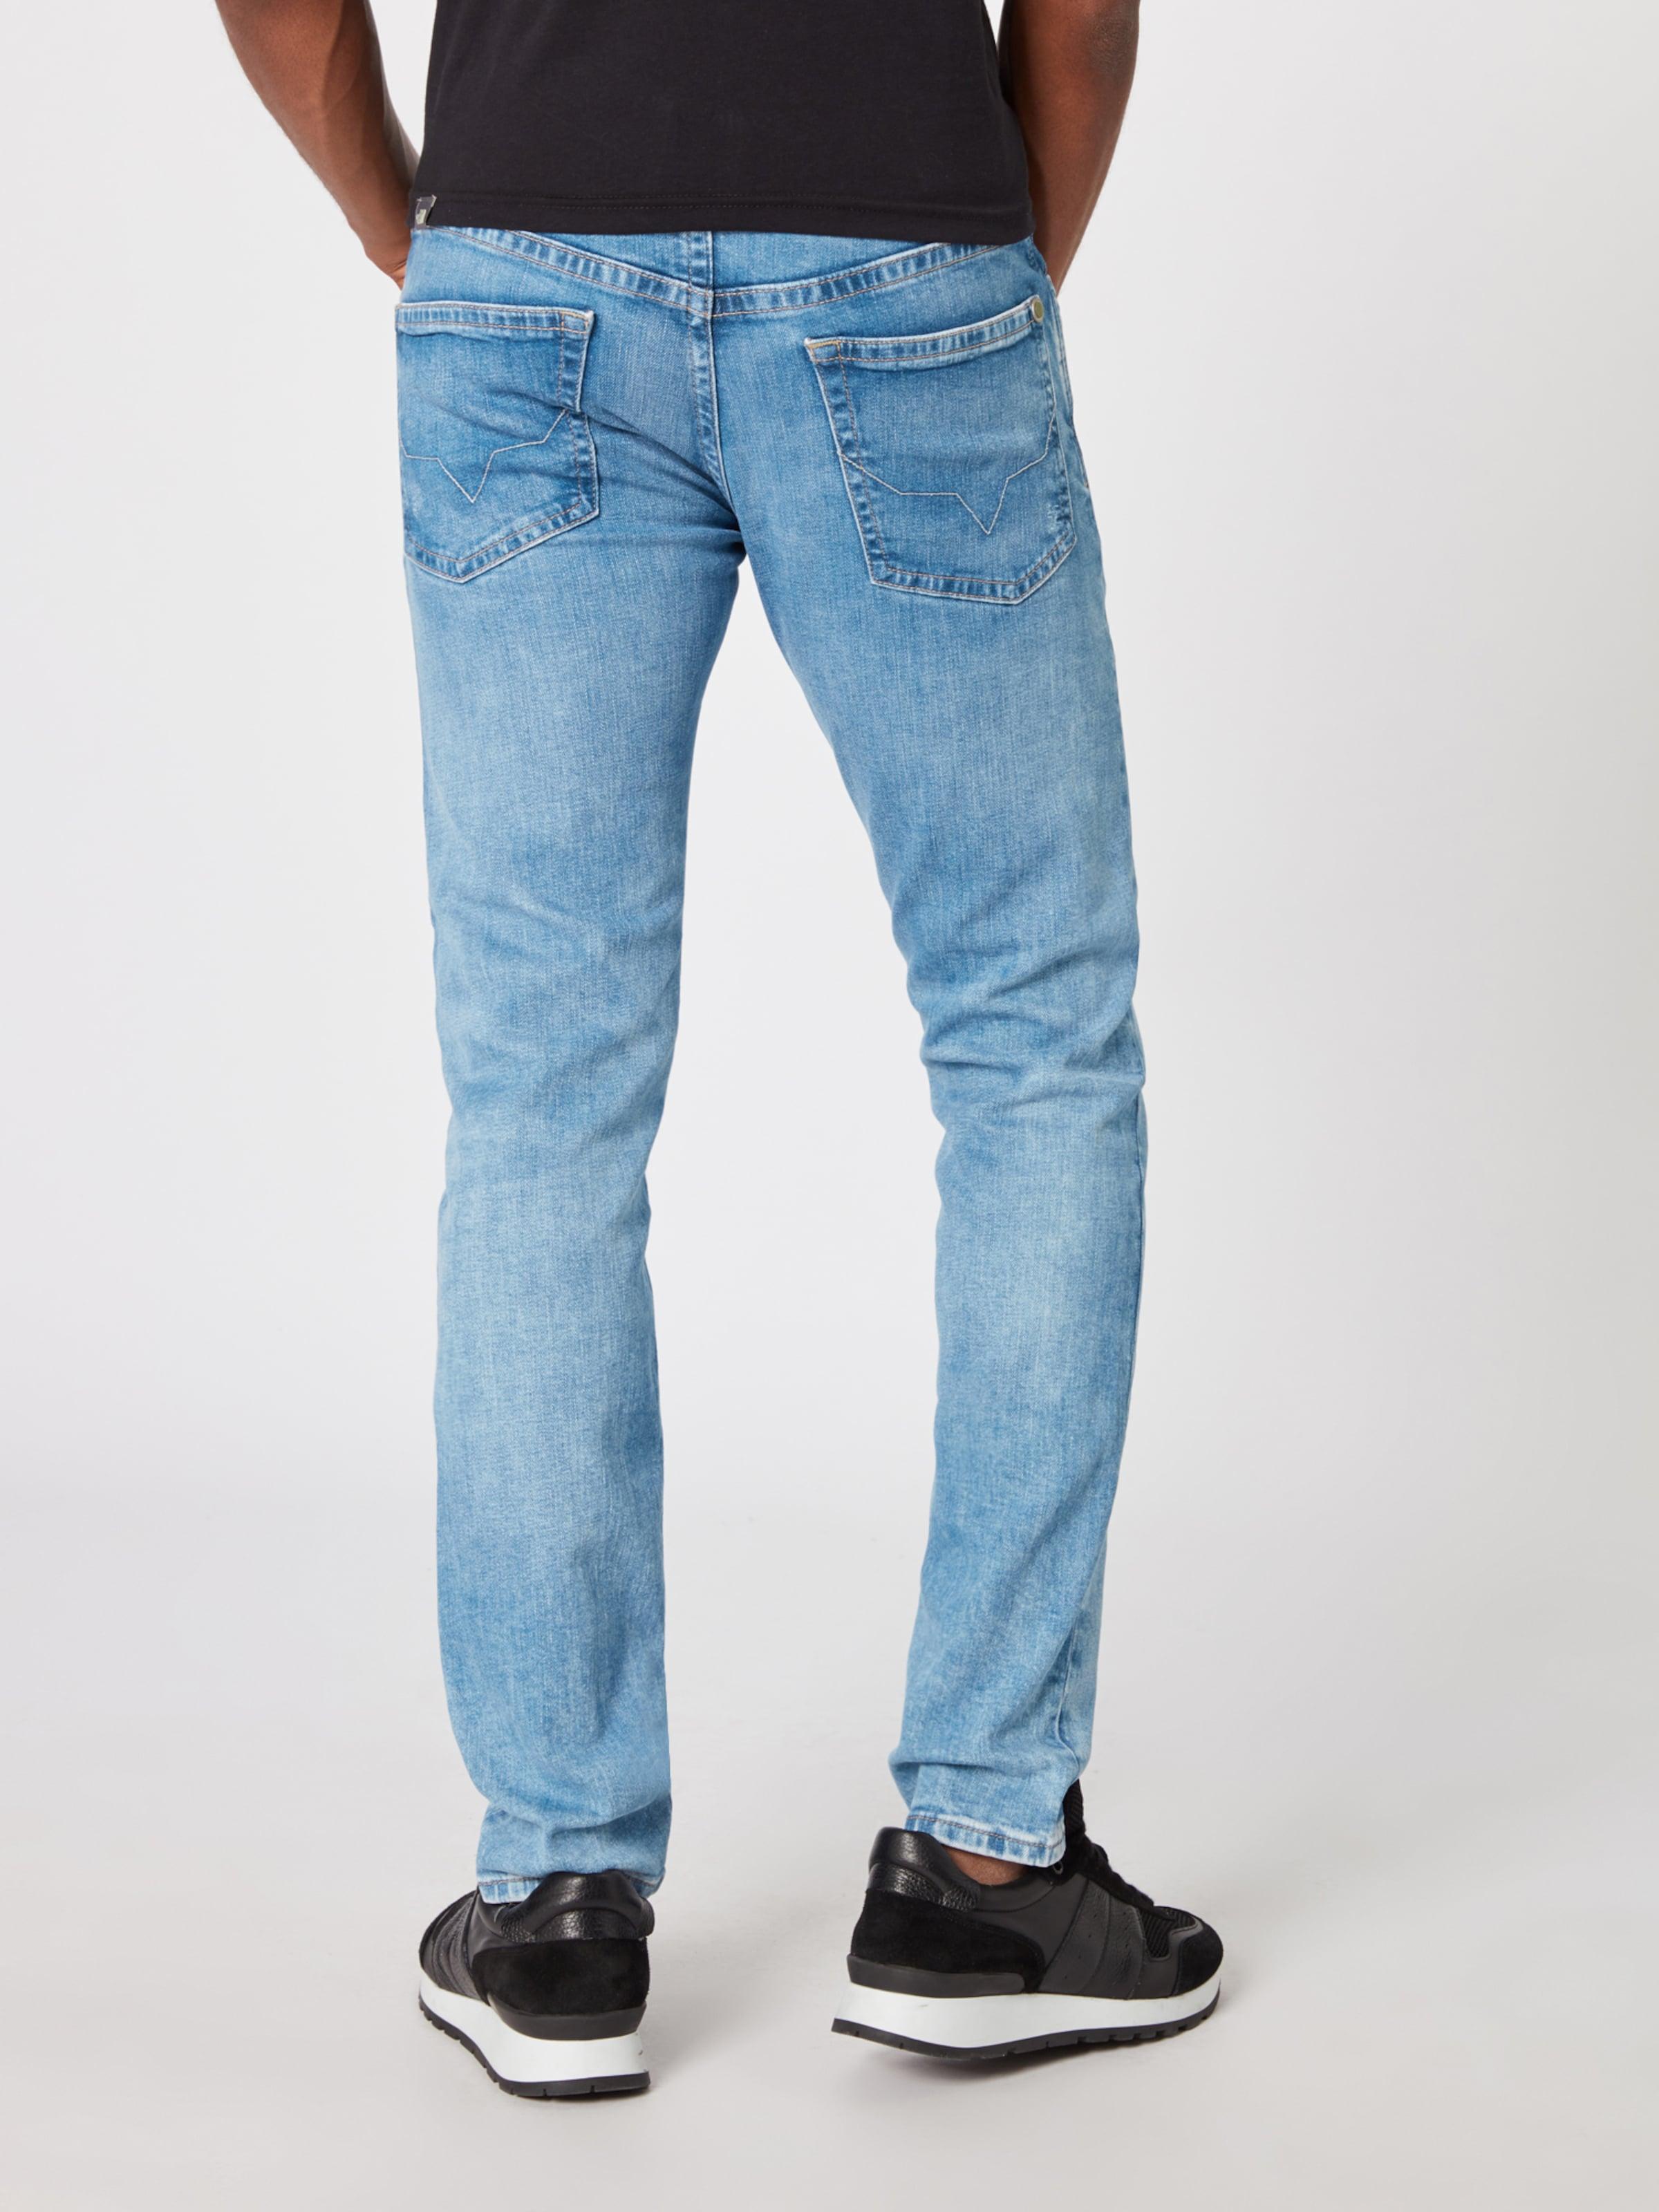 'hatch' Bleu Denim Pepe Jeans En Jean uK1cF5T3lJ